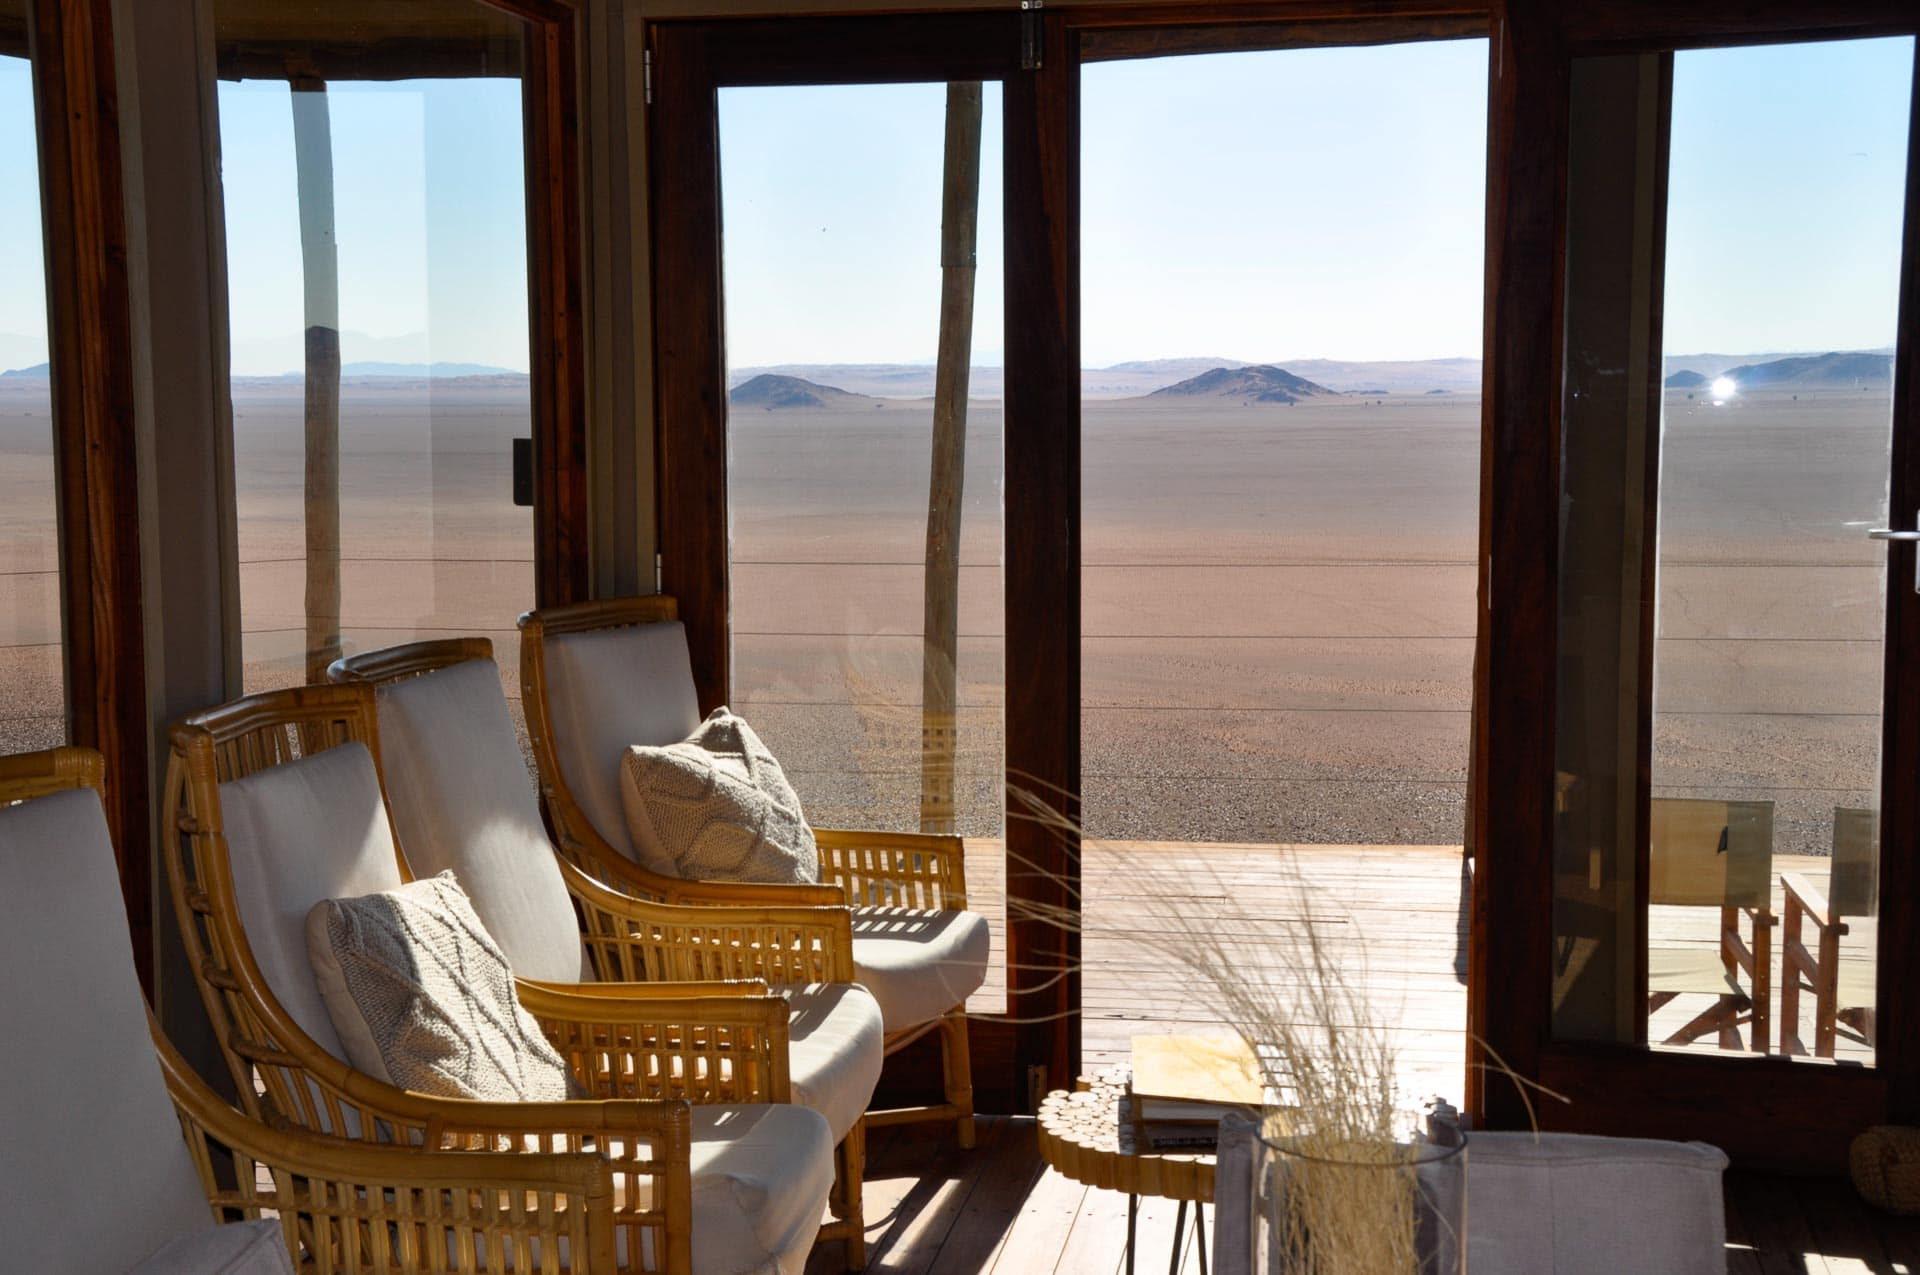 Kanaan-Desert-Retreat-Namibia-Globetrotter-Select-8